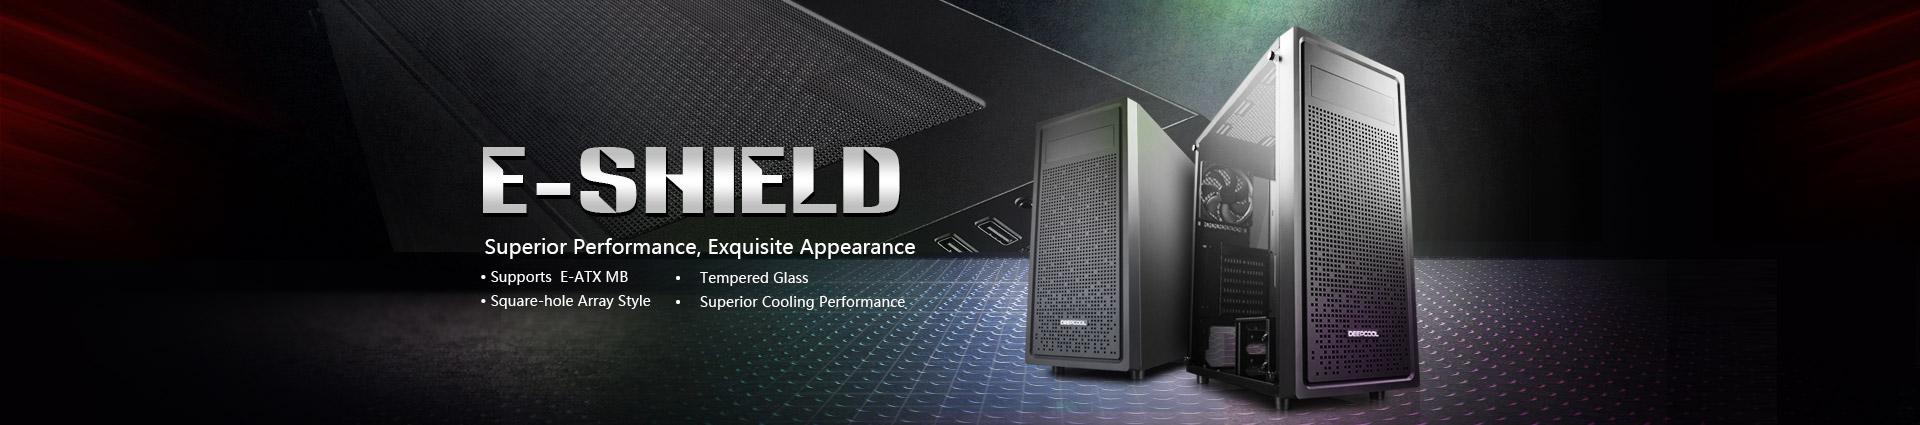 deepcool-black-e-shield-mid-tower-chassis.jpg